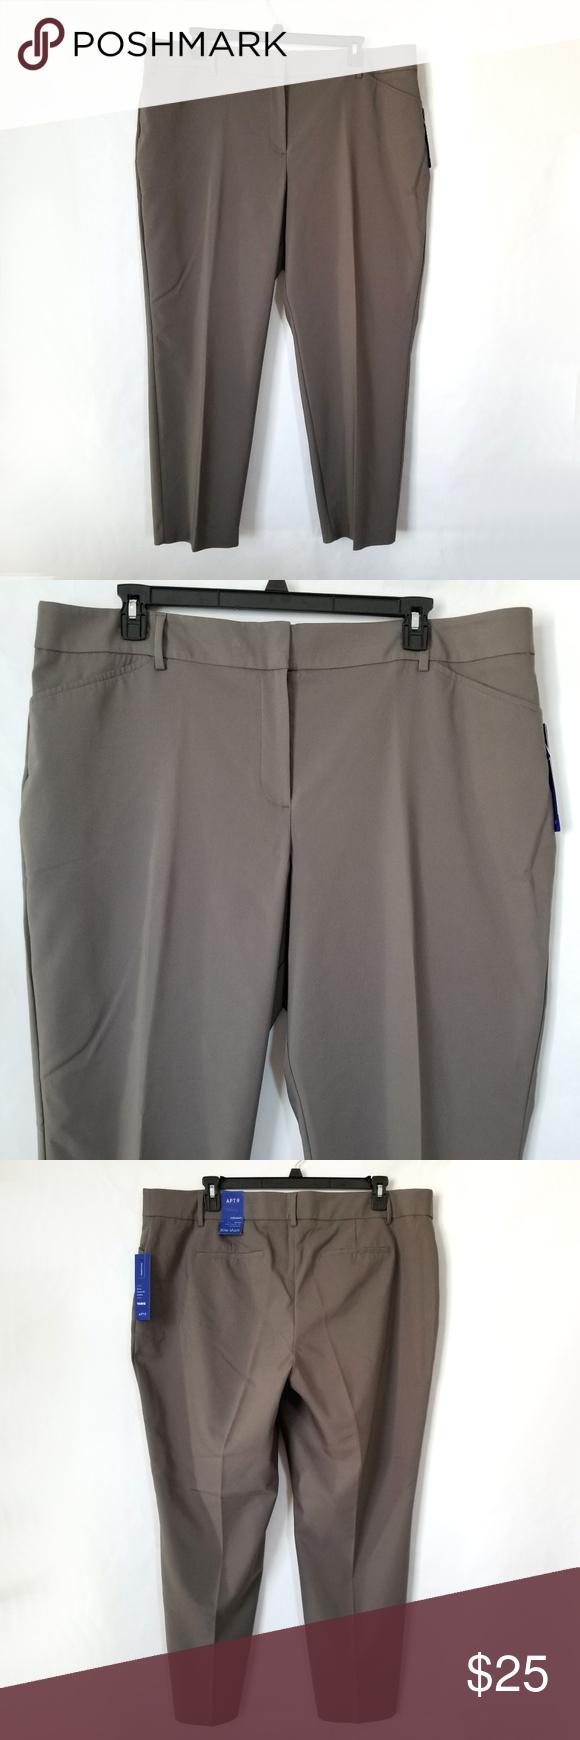 021d091c48f Apt. 9 Torie Modern Fit Straight-Leg Dress Pants New with tags. Plus